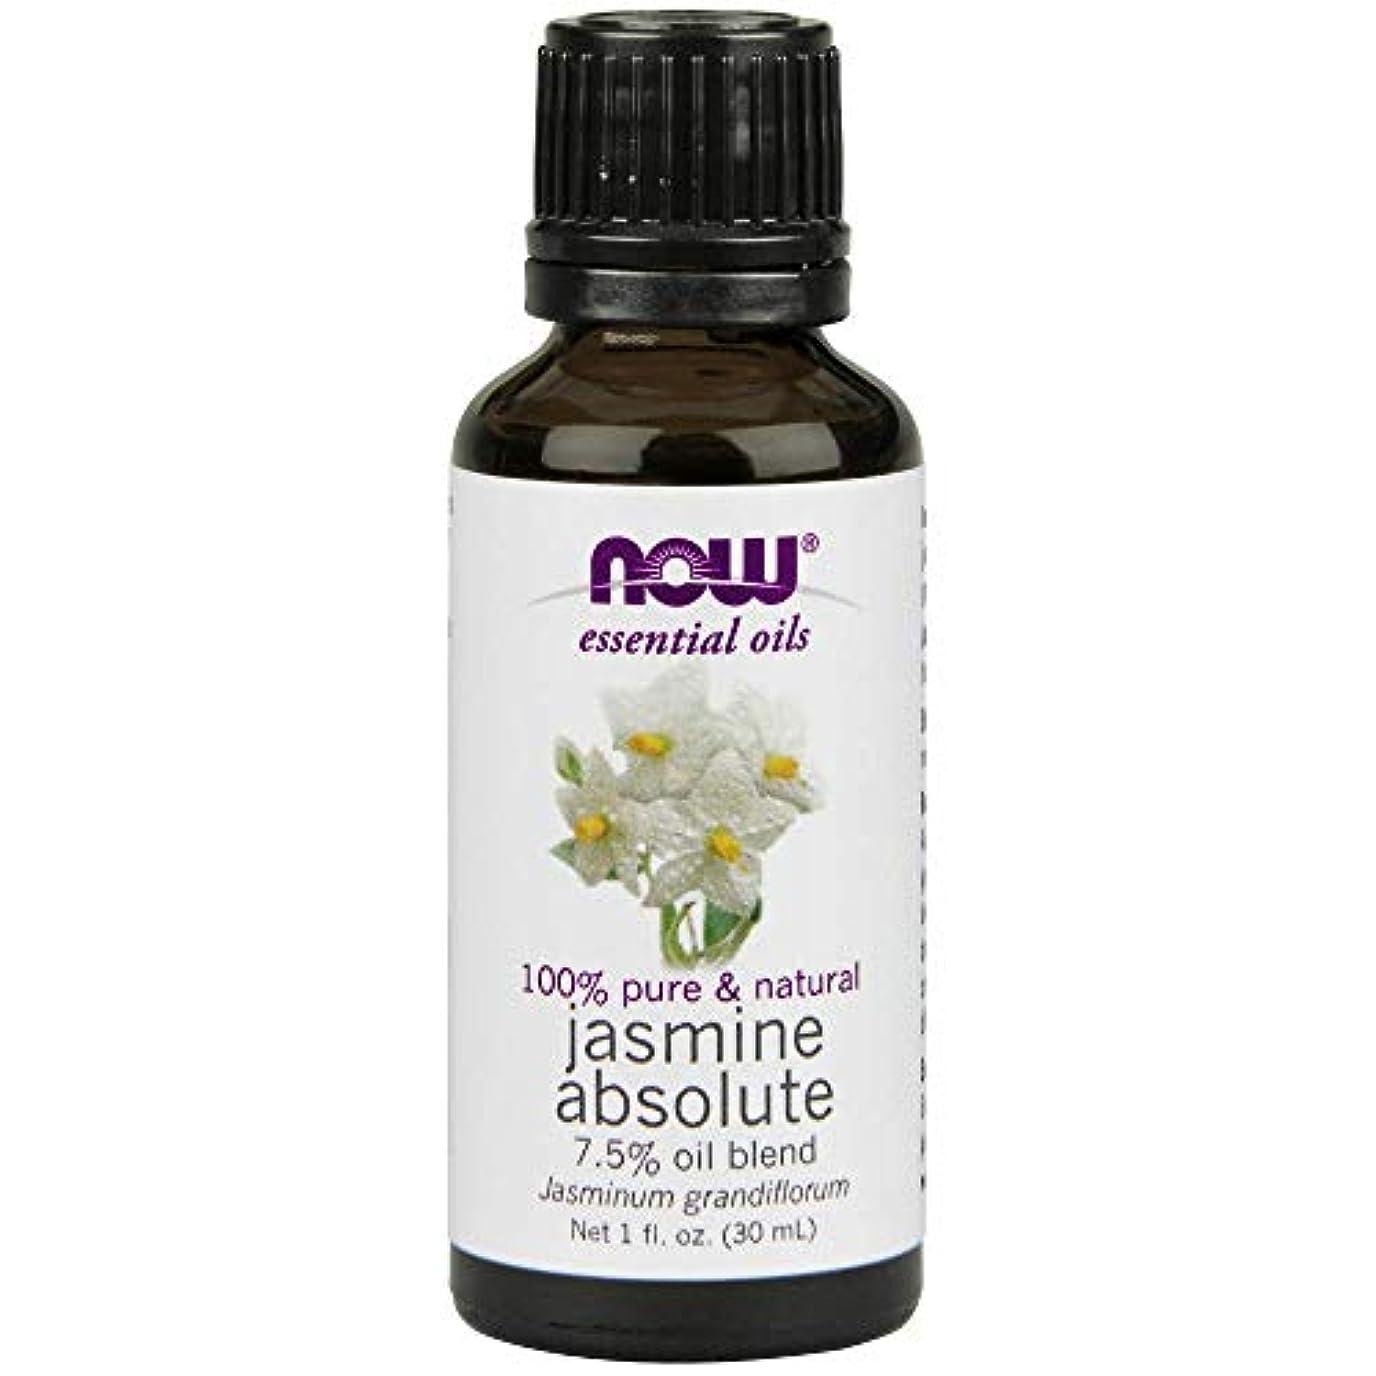 三番応答感情のNow - Jasmine Absolute Oil 7.5% Oil Blend 1 oz (30 ml) [並行輸入品]